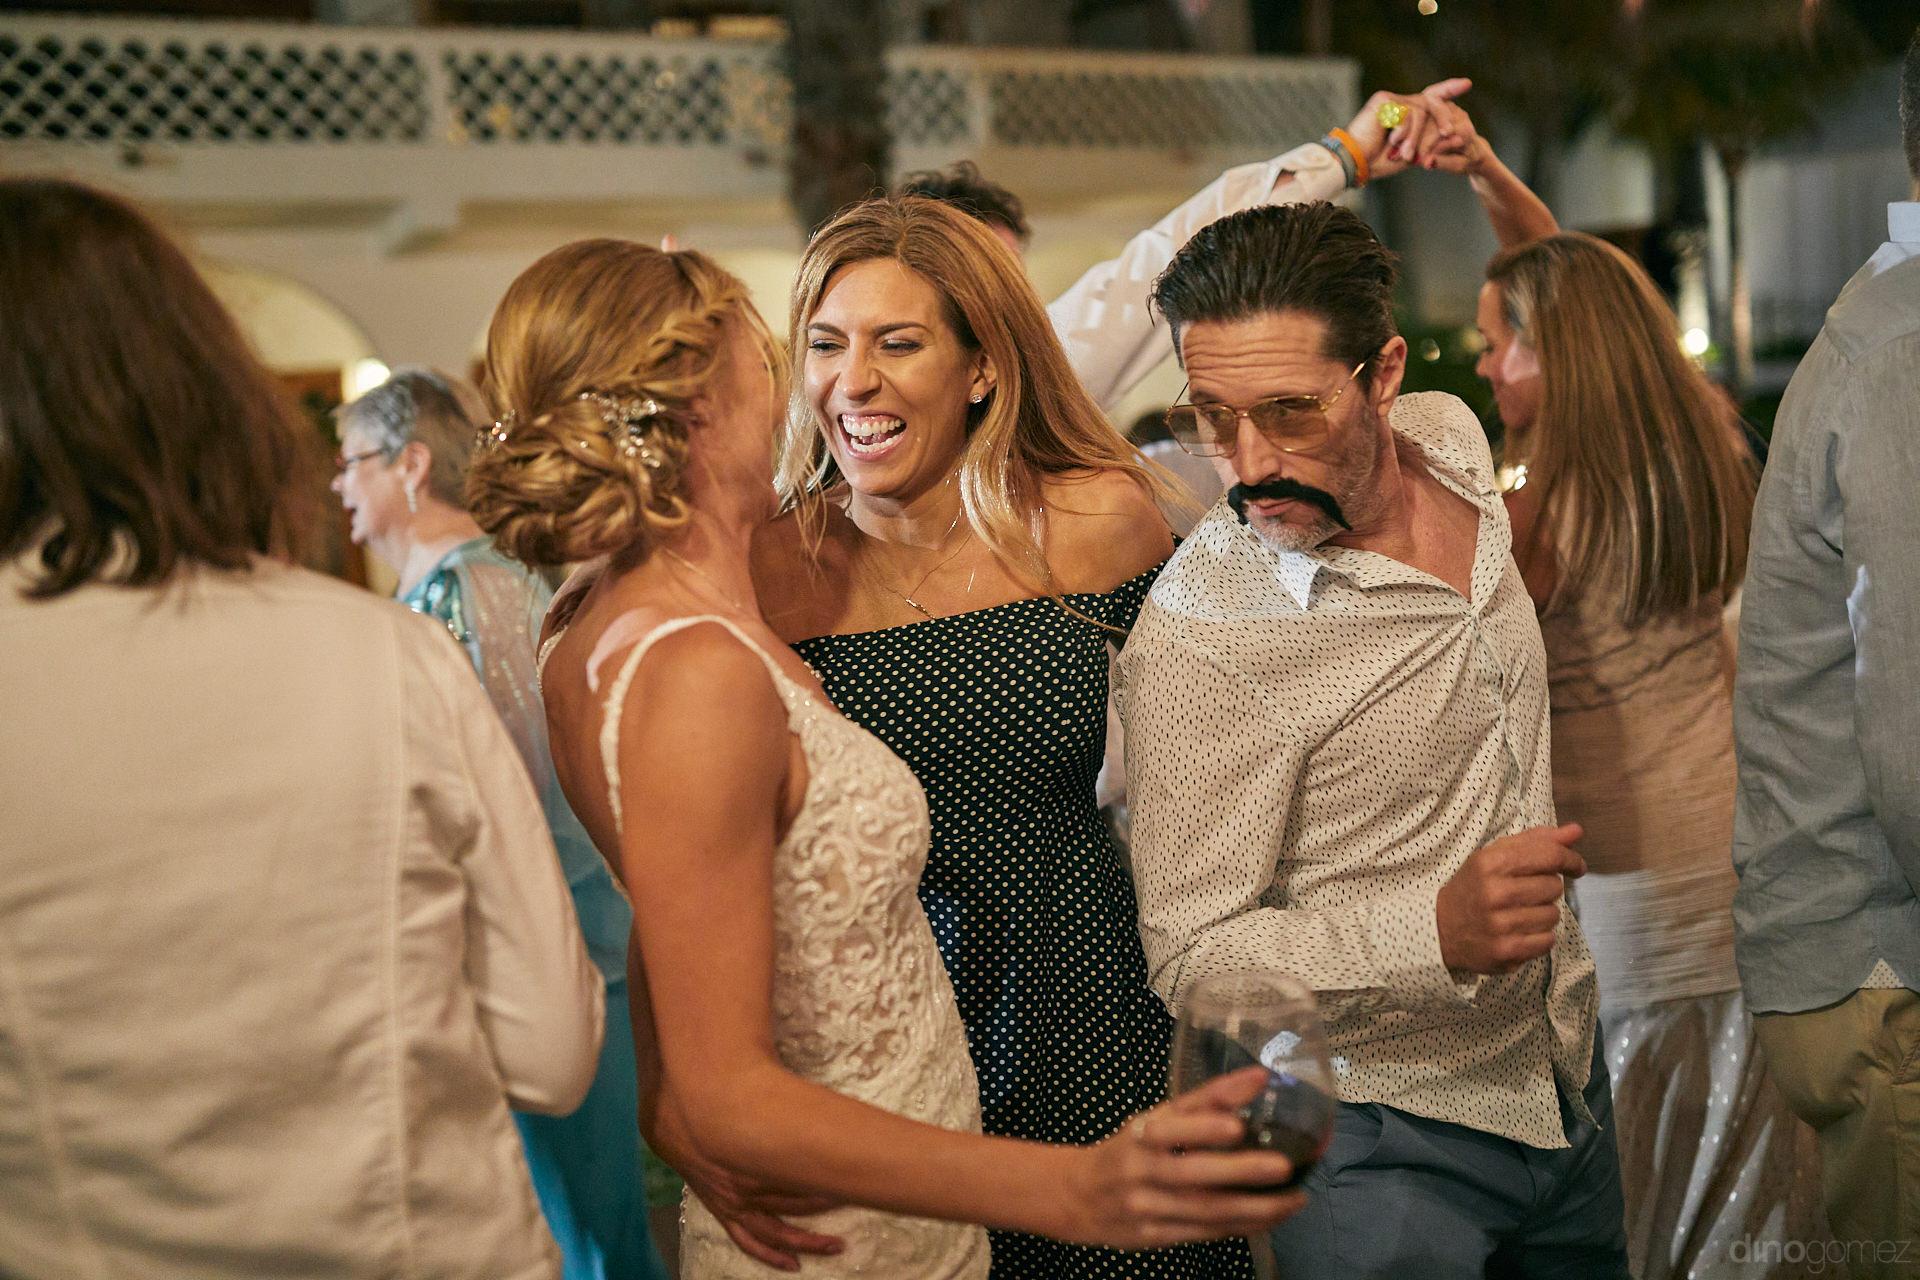 Los Cabos Wedding Vendors List Had Dino Gomez Photographer At The Top